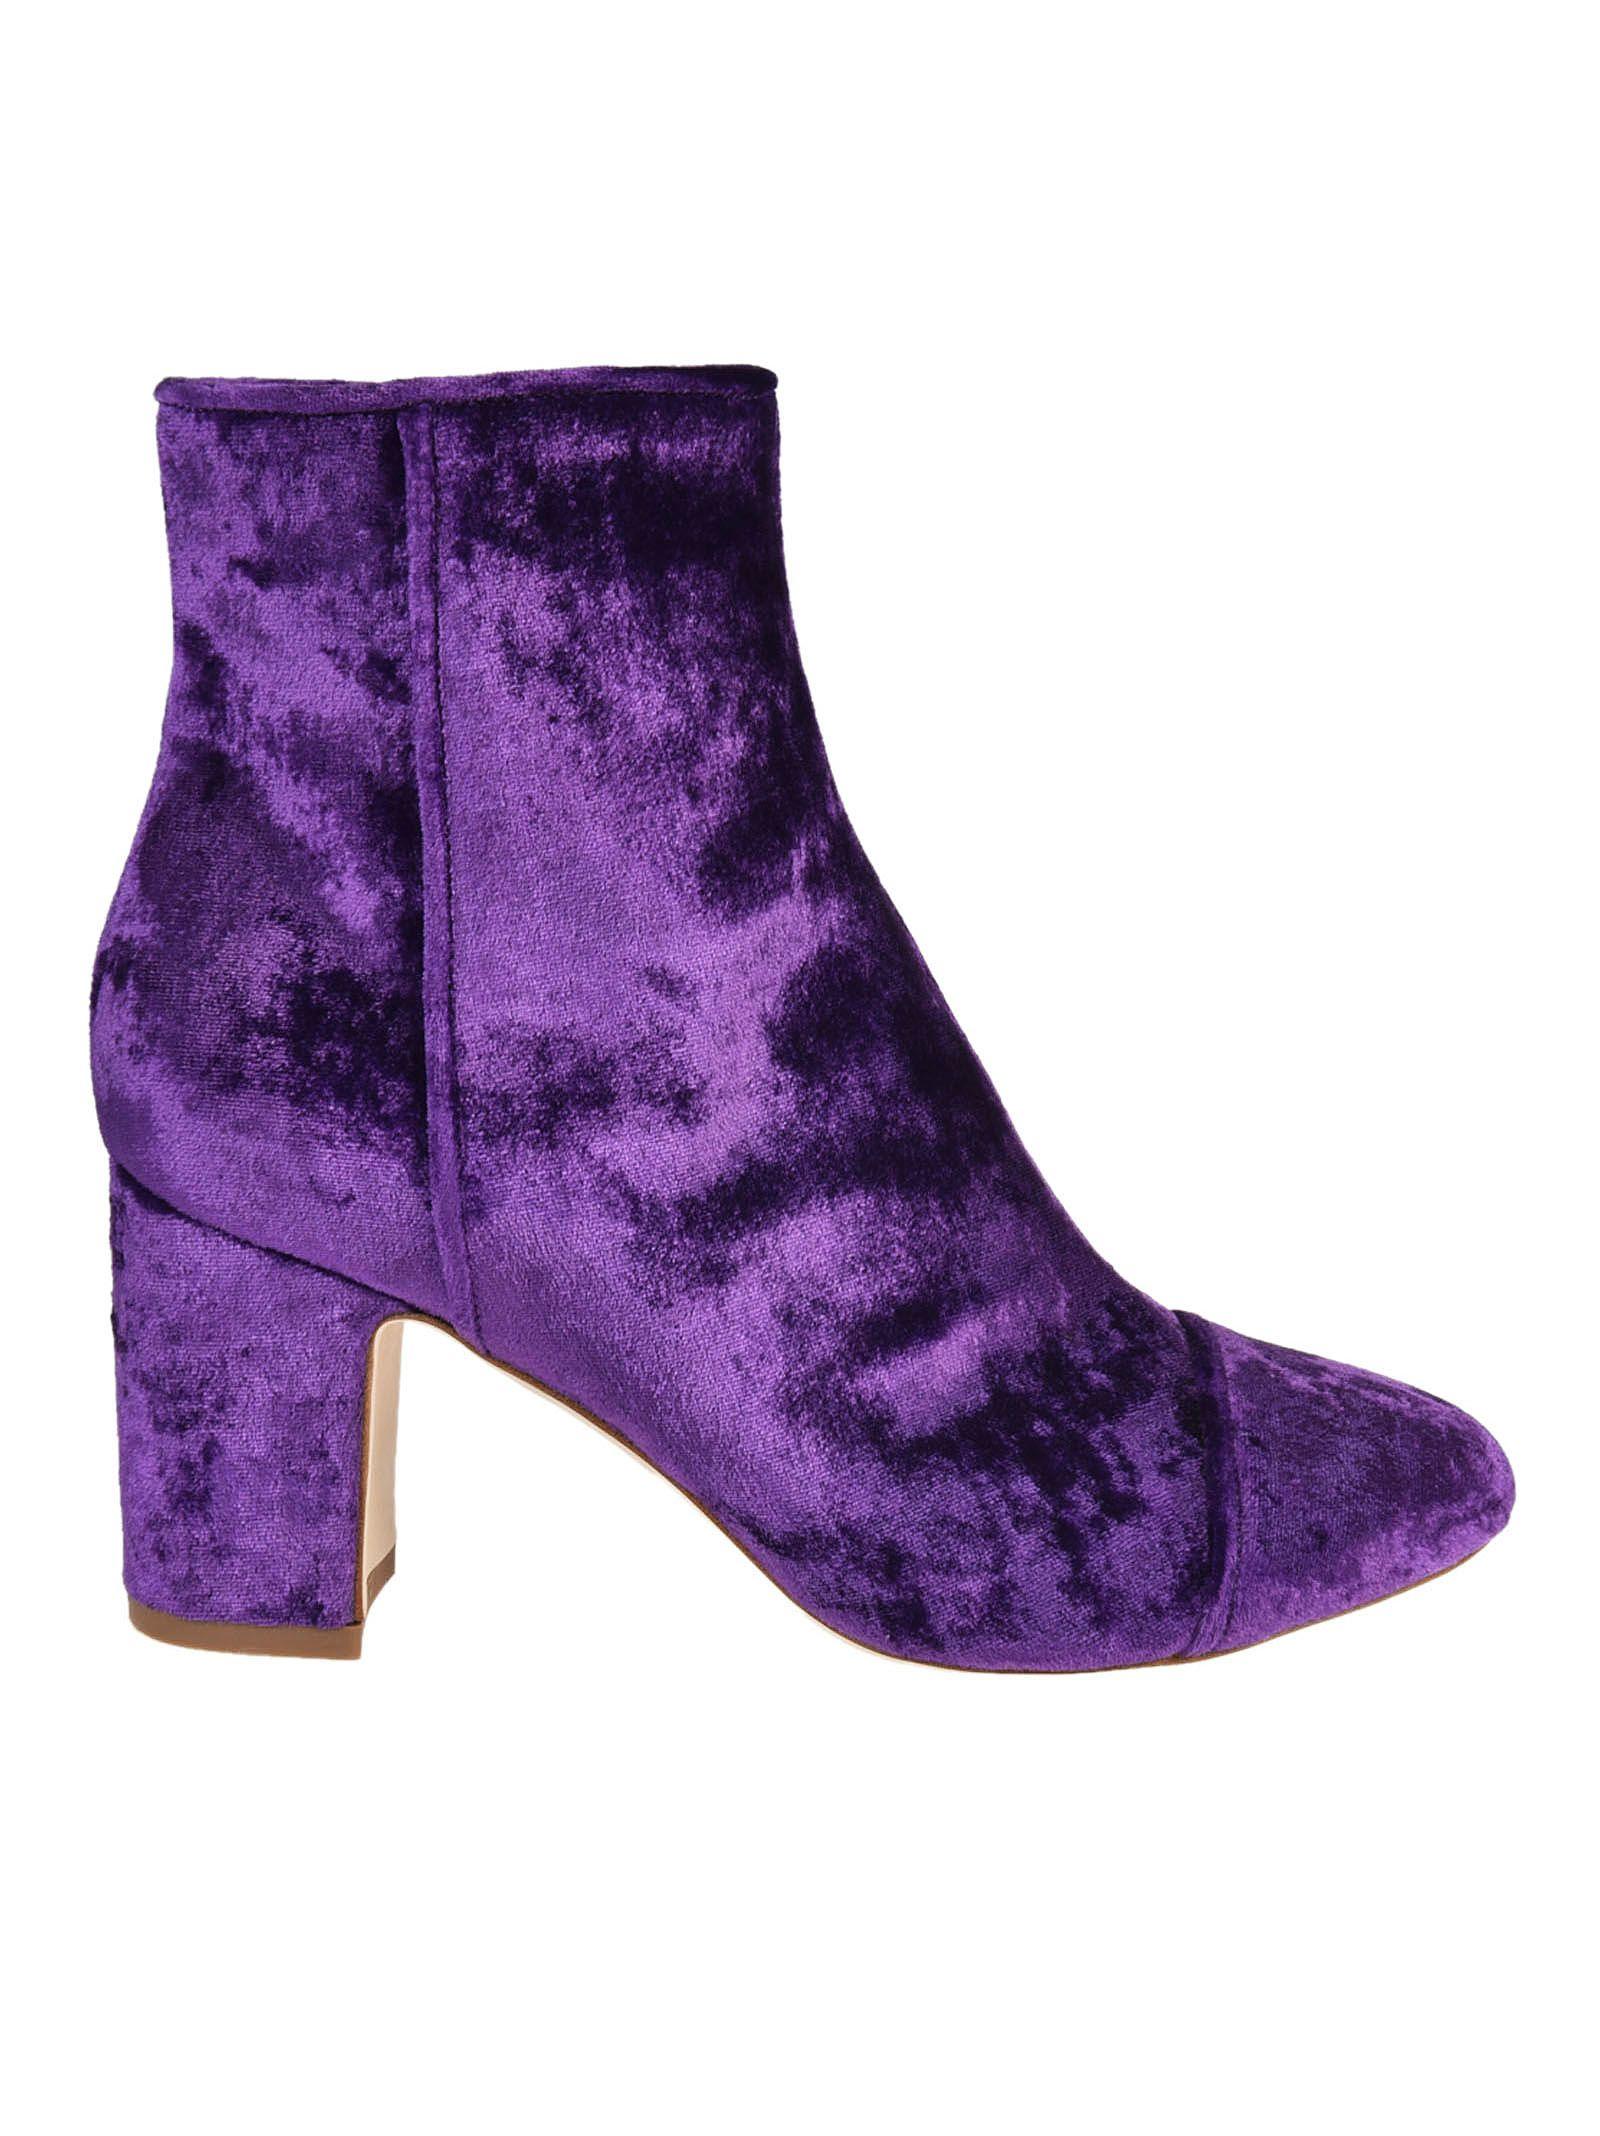 Polly Plume Ally Velvet Ankle Boots